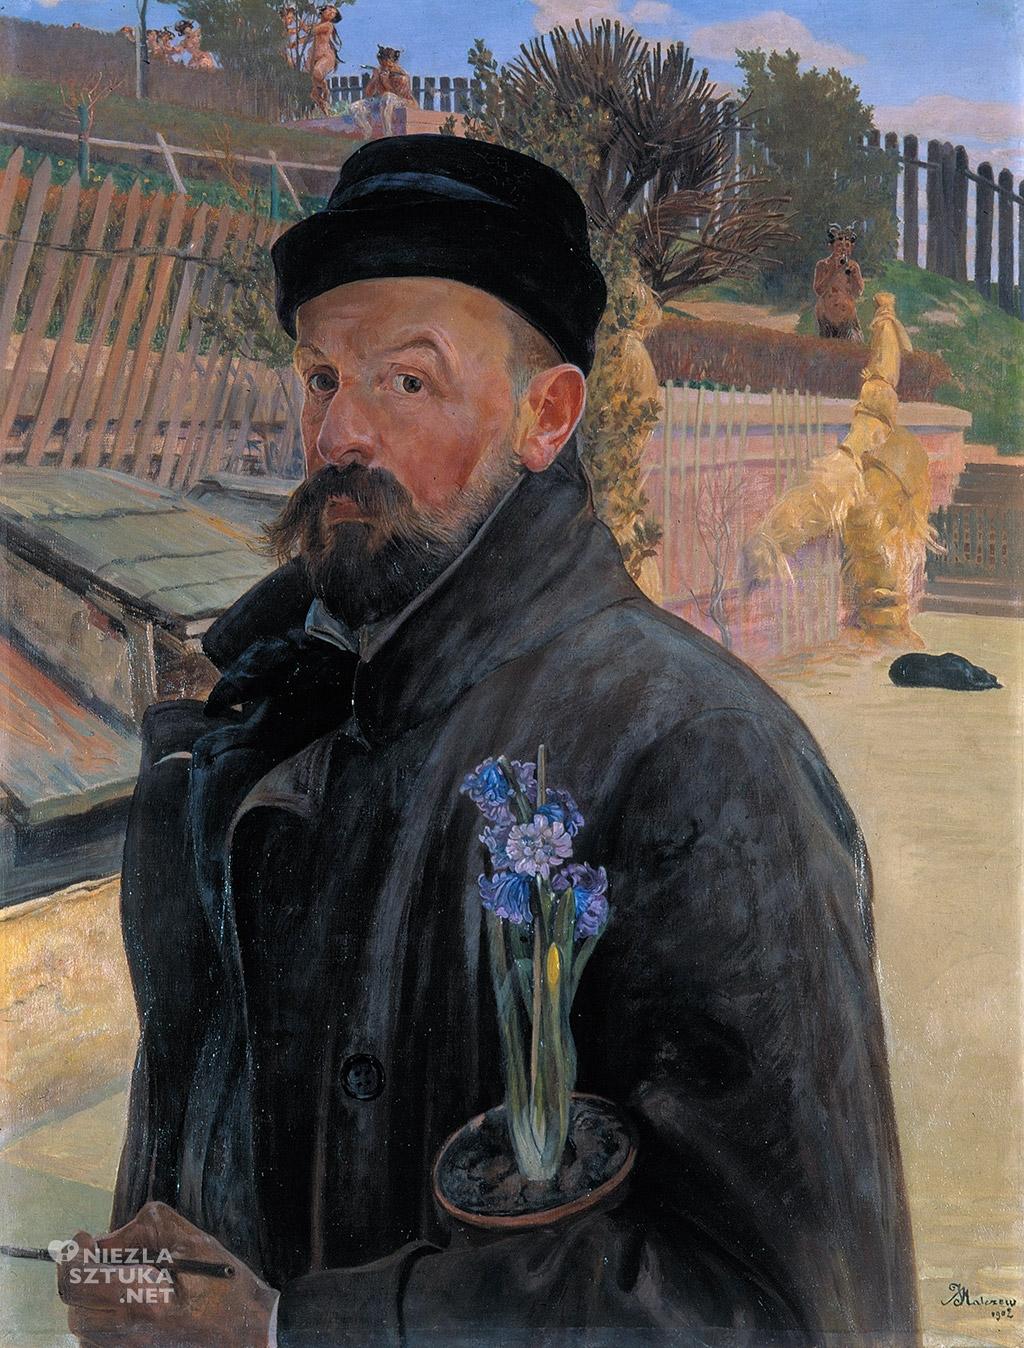 Jacek Malczewski, Autoportret z hiacyntem, sztuka polska, symbolizm, Niezła sztuka